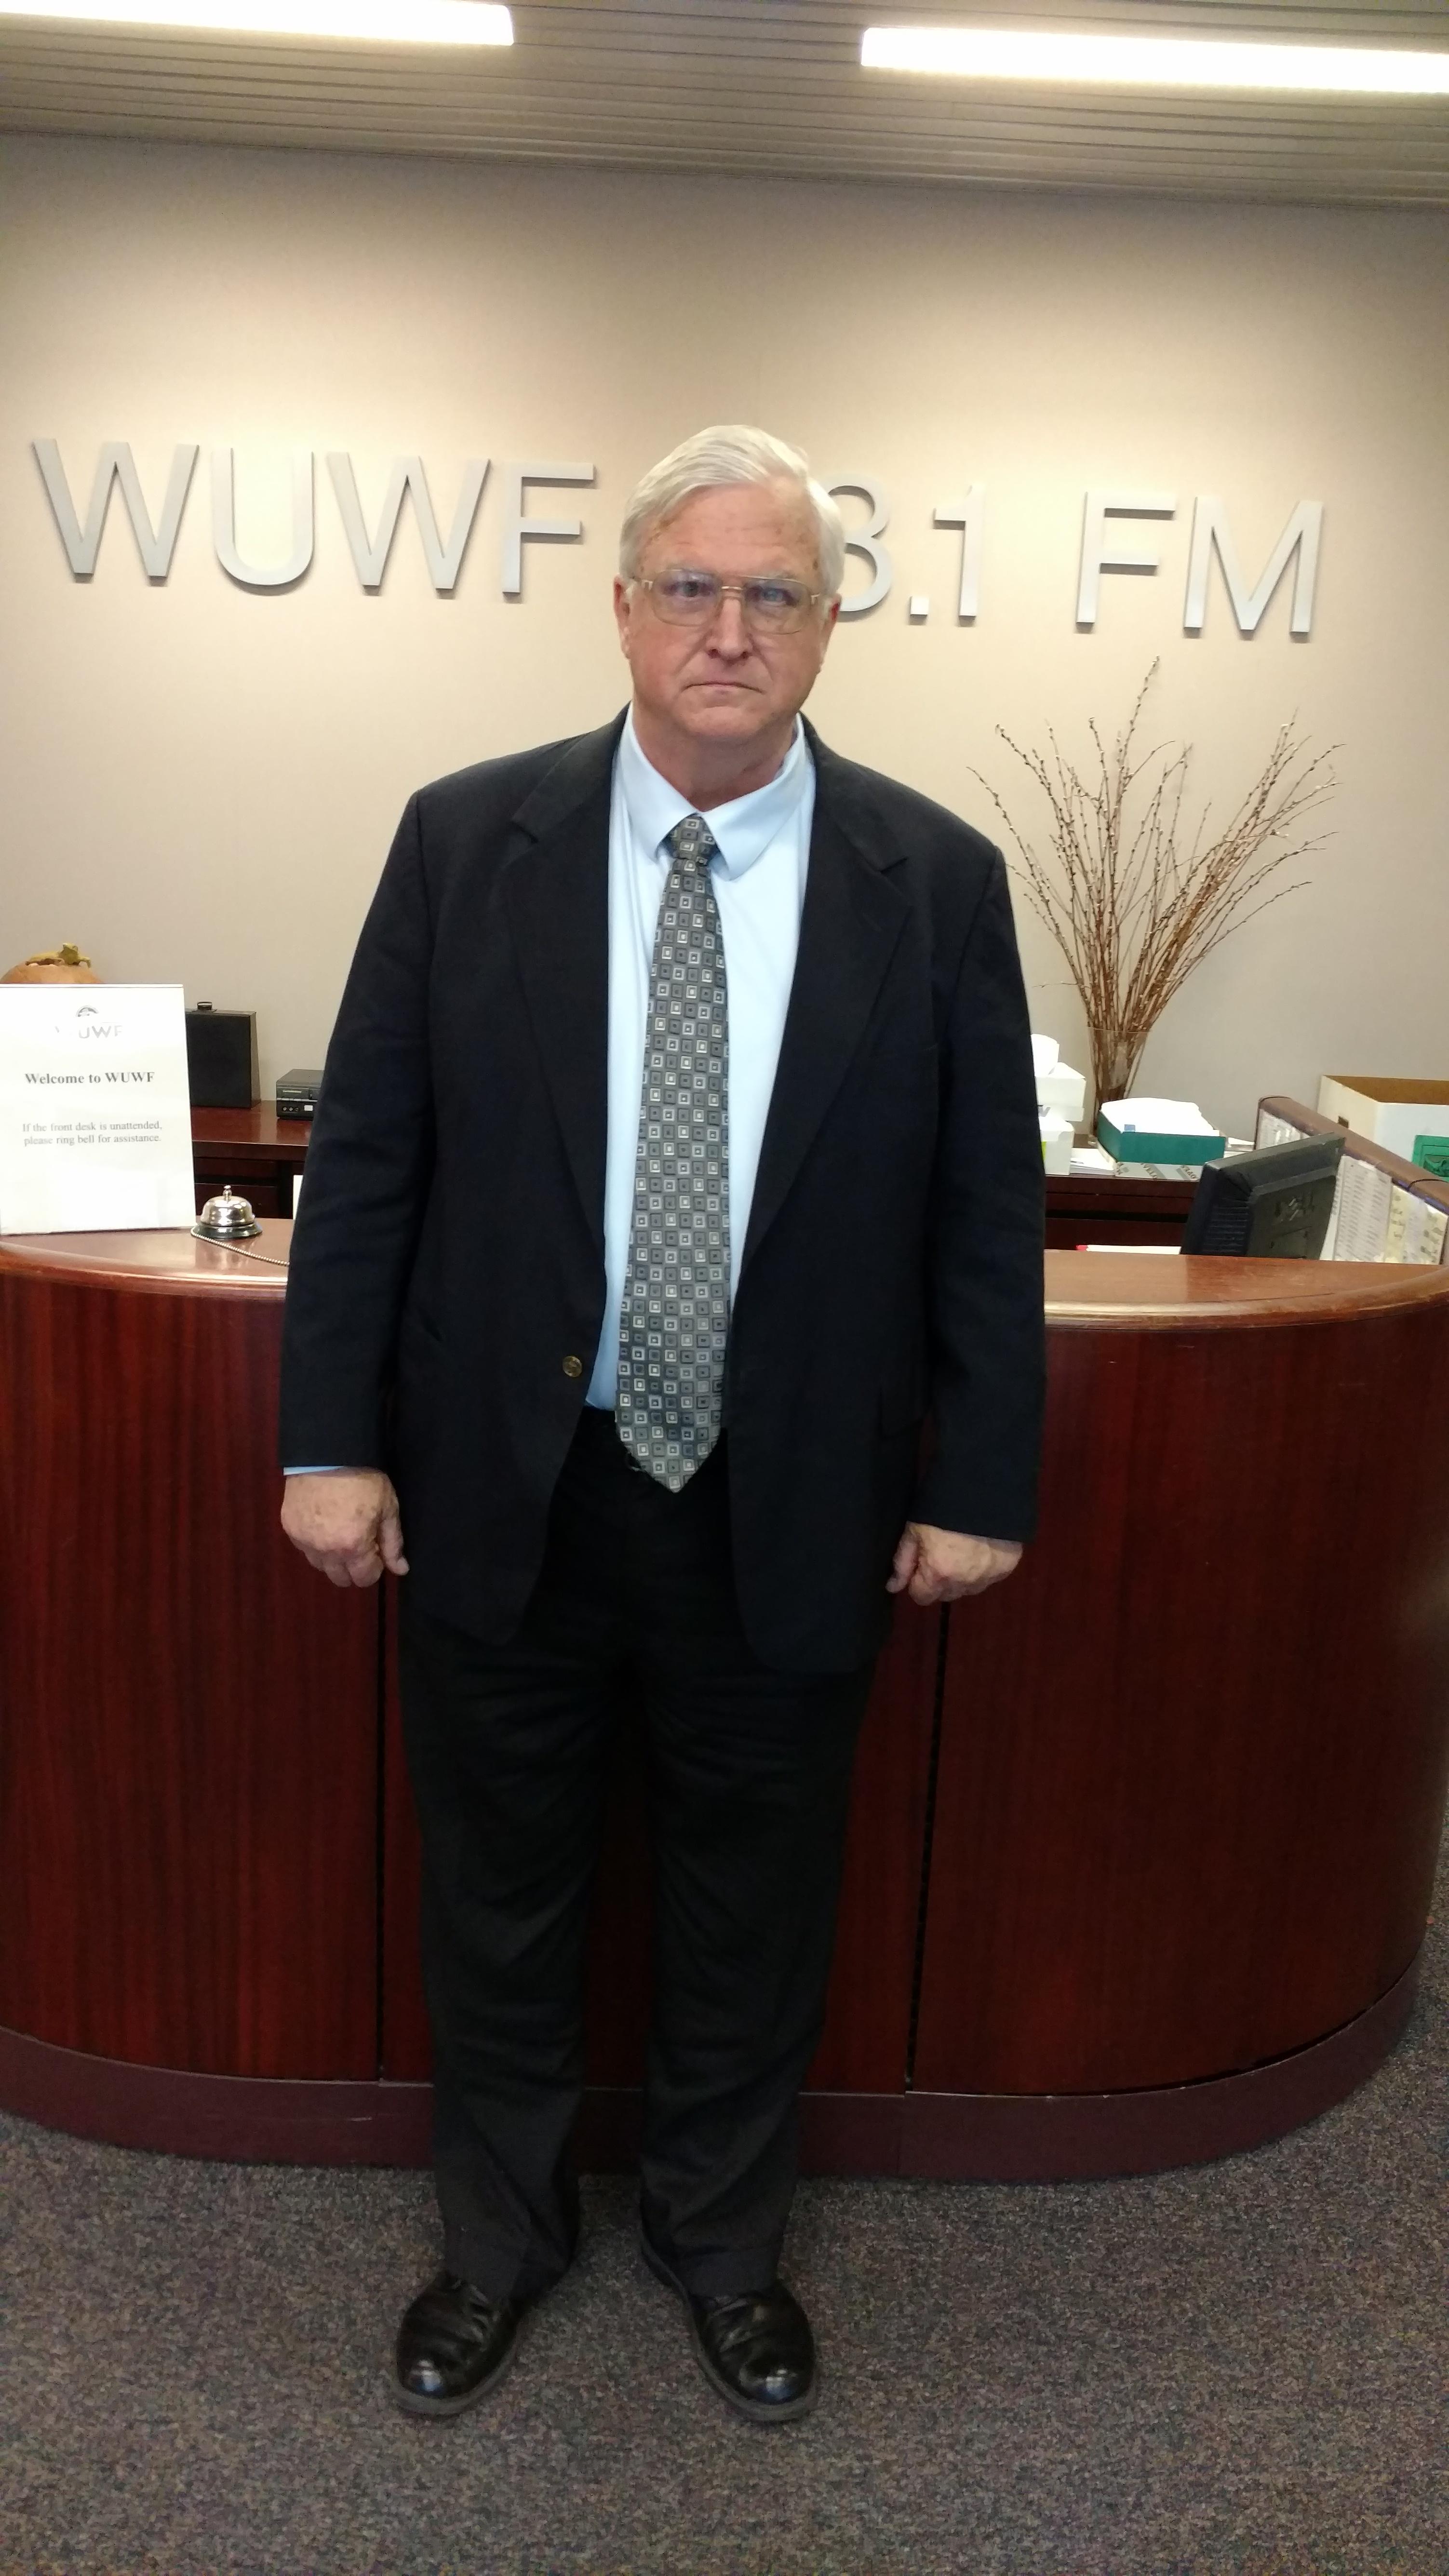 Ted Bundy Prosecutor Visits UWF